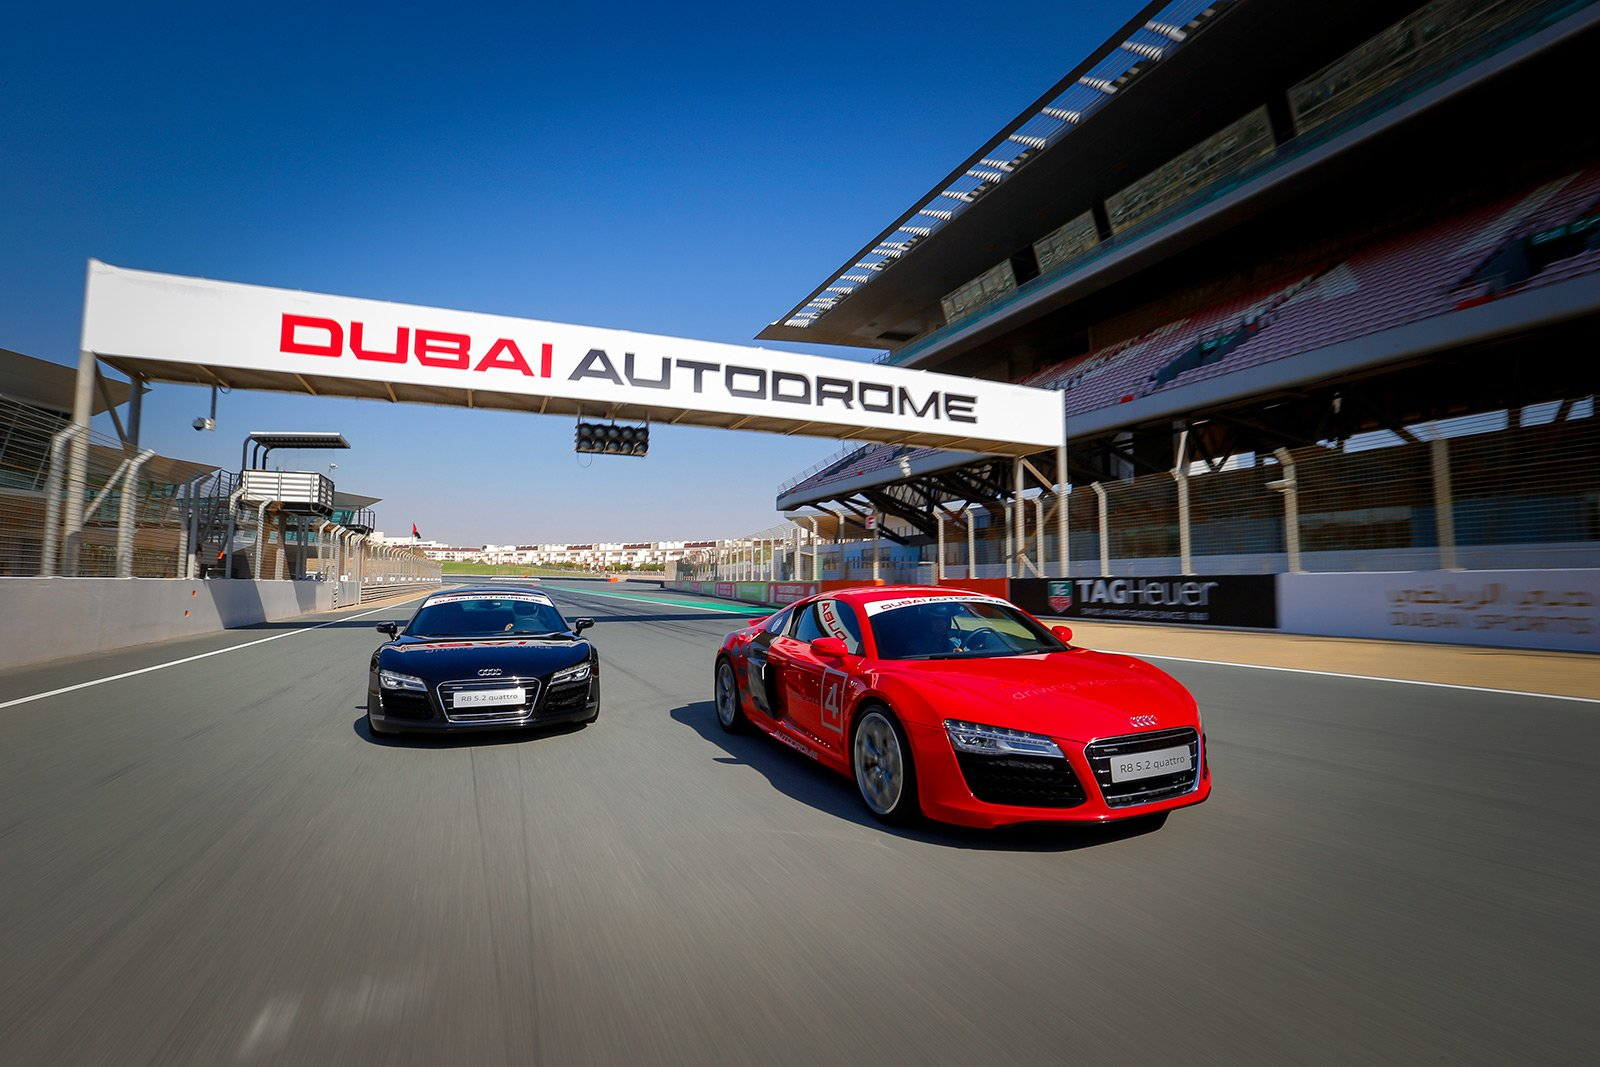 Dubai Autodrome Dubai